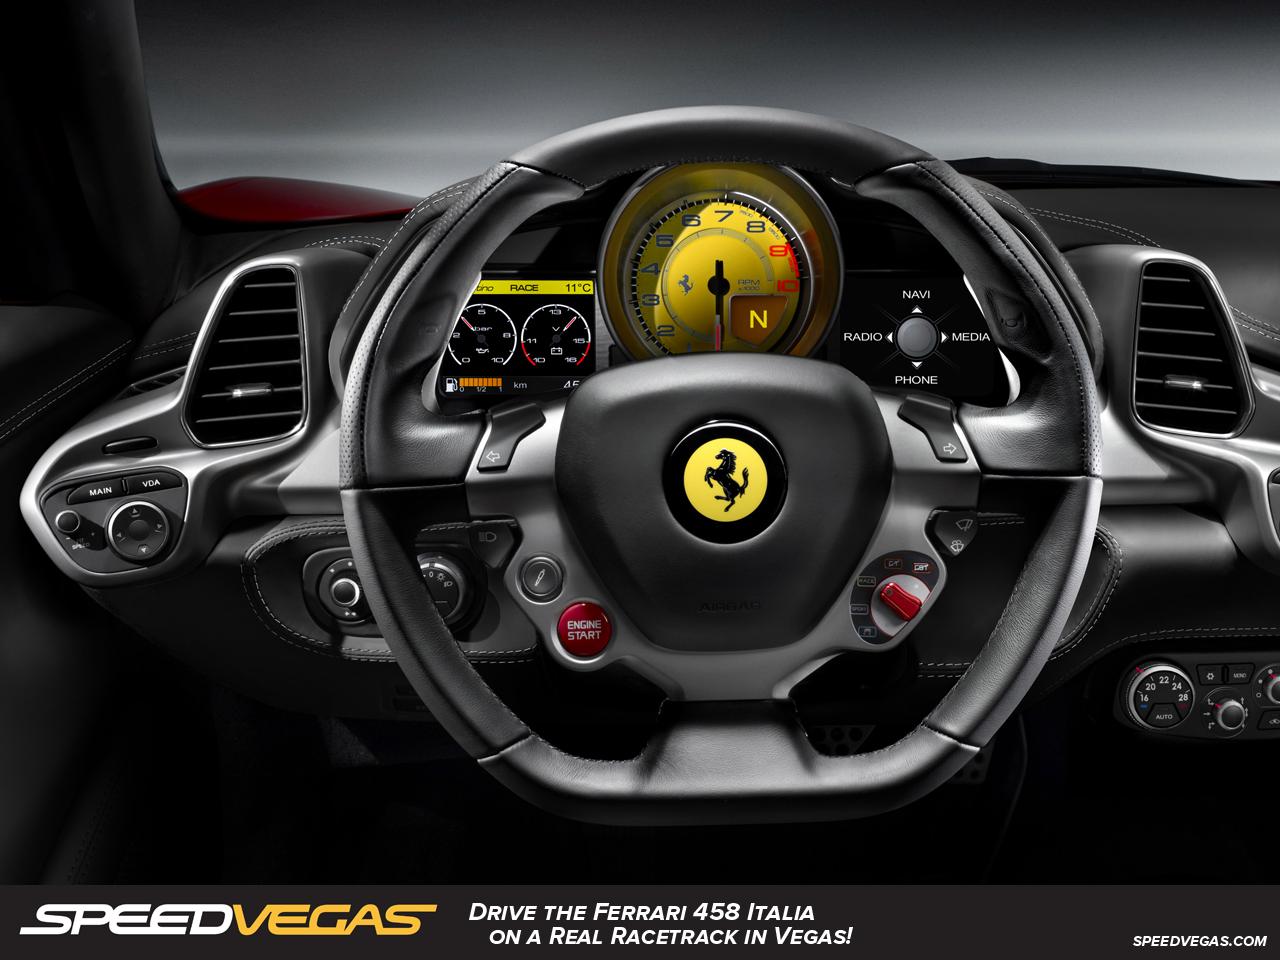 drive a ferrari 458 italia in las vegas ferrari driving experience speedvegas. Black Bedroom Furniture Sets. Home Design Ideas